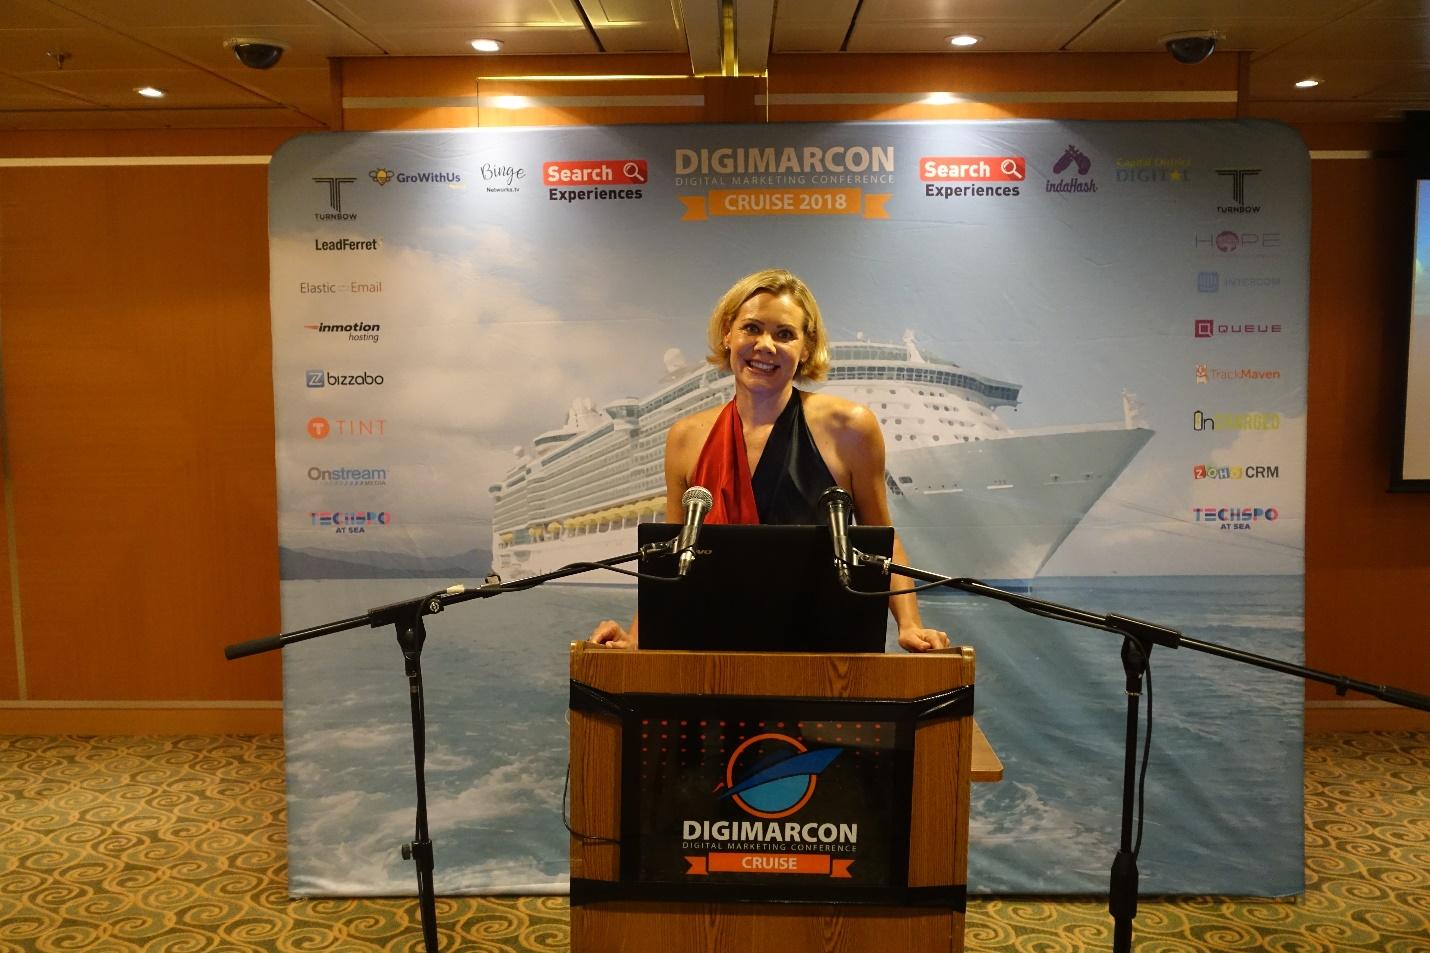 DigiMarCon Cruise 2019